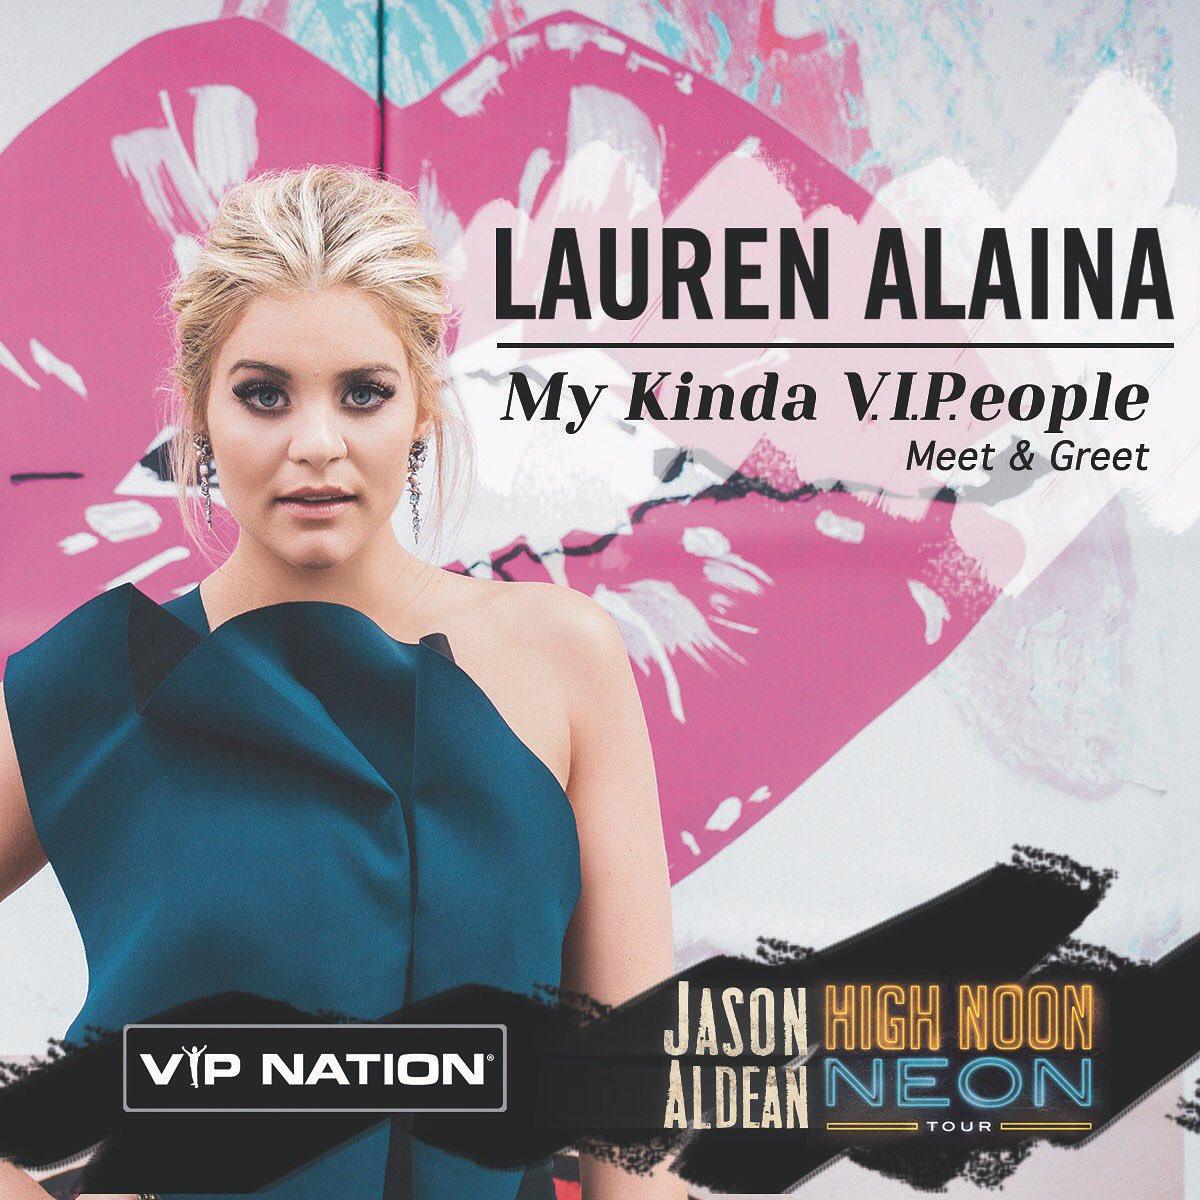 lauren alaina dating Lauren alaina net worth is $500 thousand next boyfriend, like my mother does, greensburg, pa, united states, newark, oh, united states, nashville, tn.